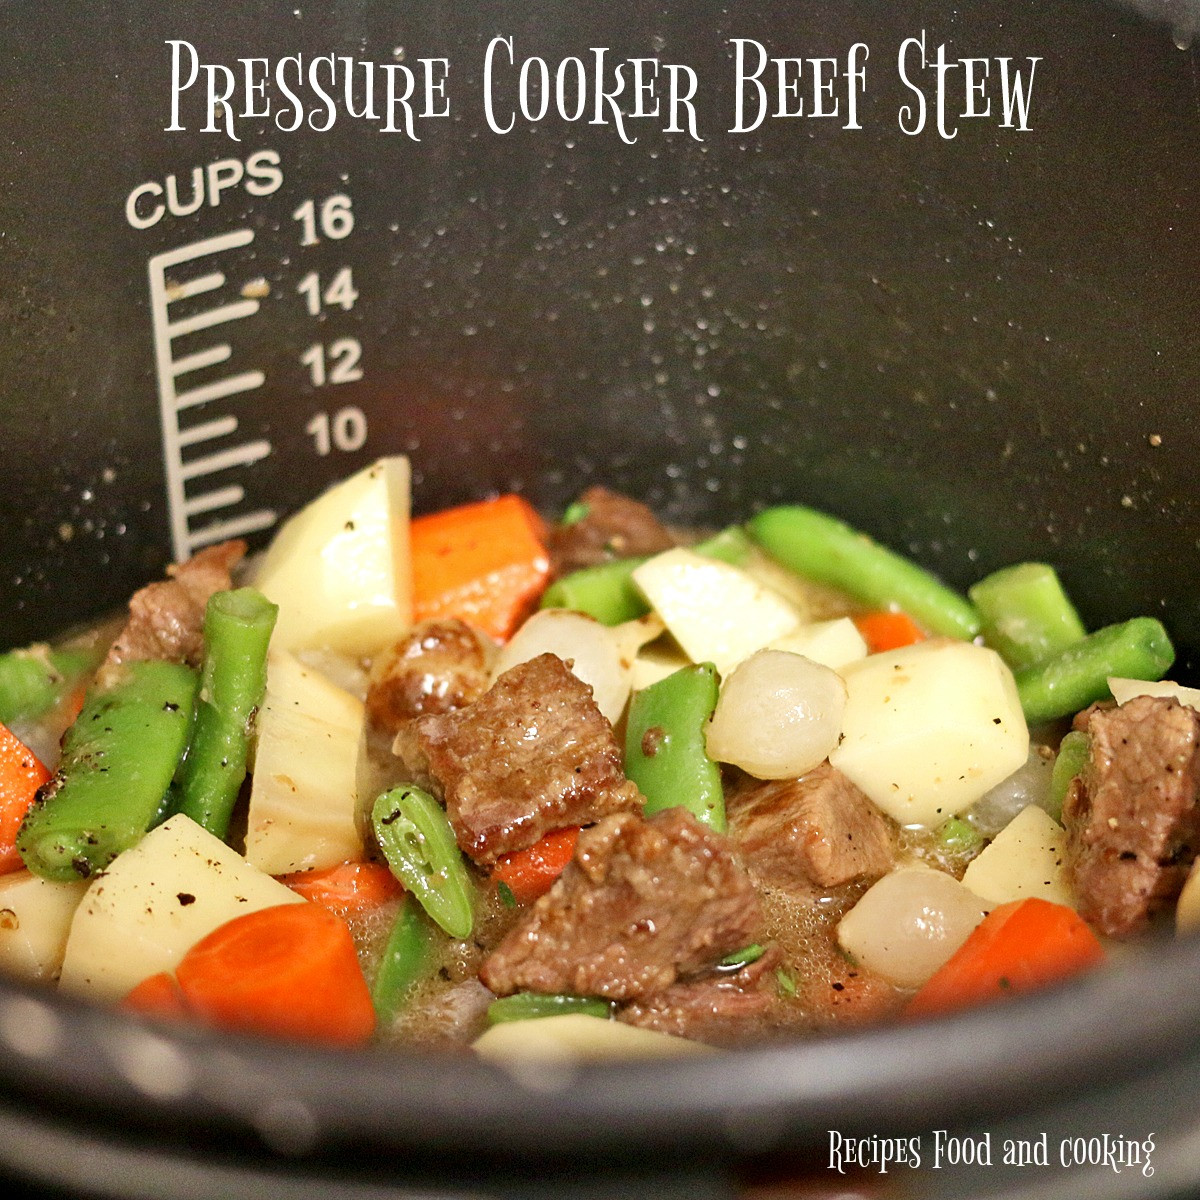 Pressure Cooker Beef Stew Recipe  Pressure Cooker Beef Stew